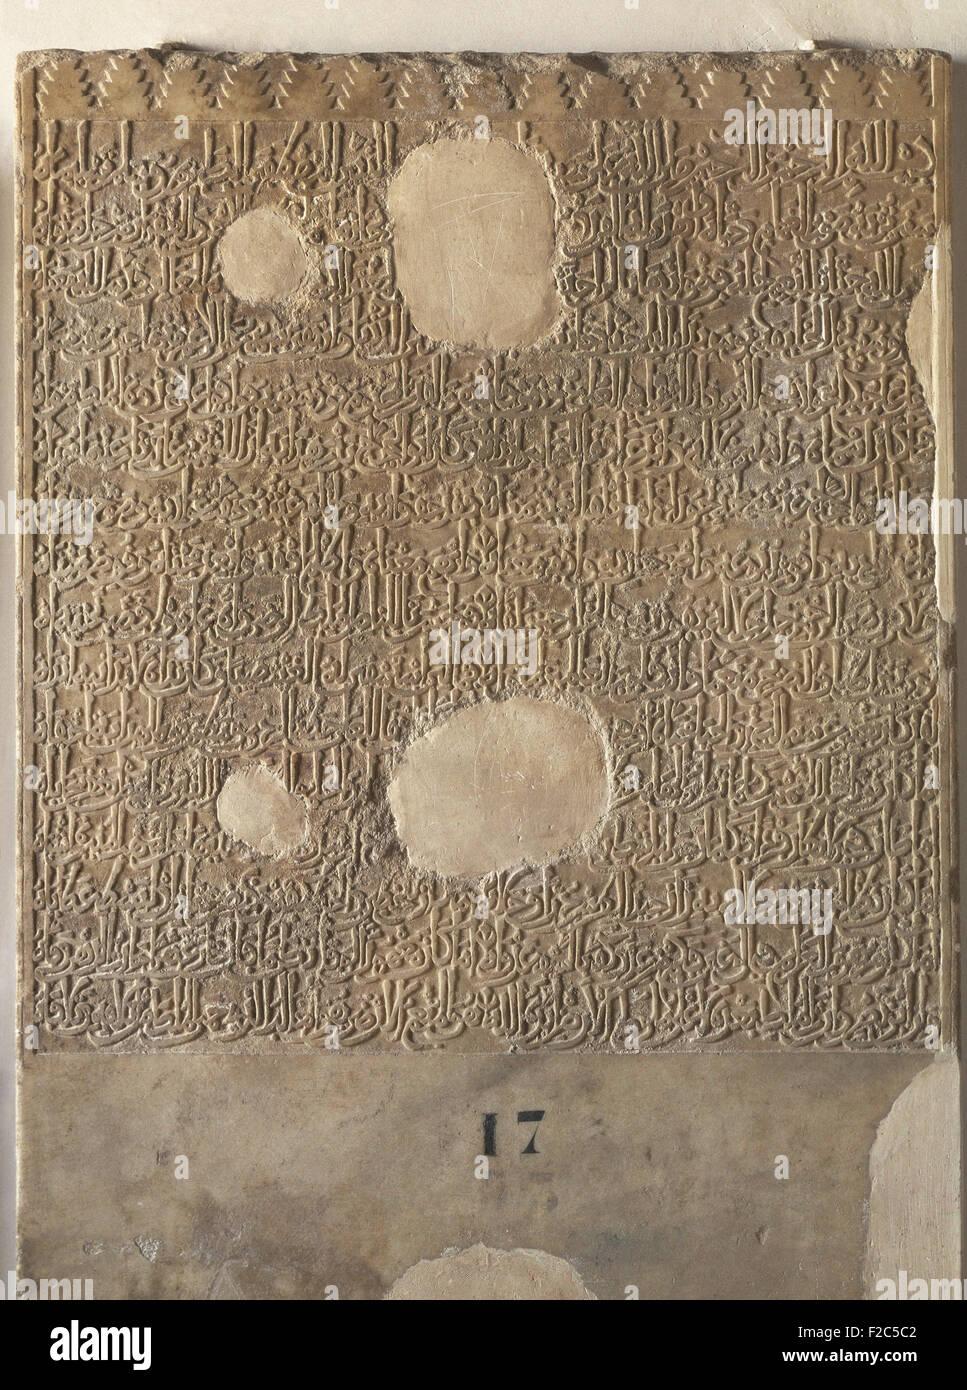 Yusuf III (1374-1417). 13th Nasrid Nasrid ruler or the Moorish Emirate of Granada, Al-Andalus. Sepulchral stele. - Stock Image